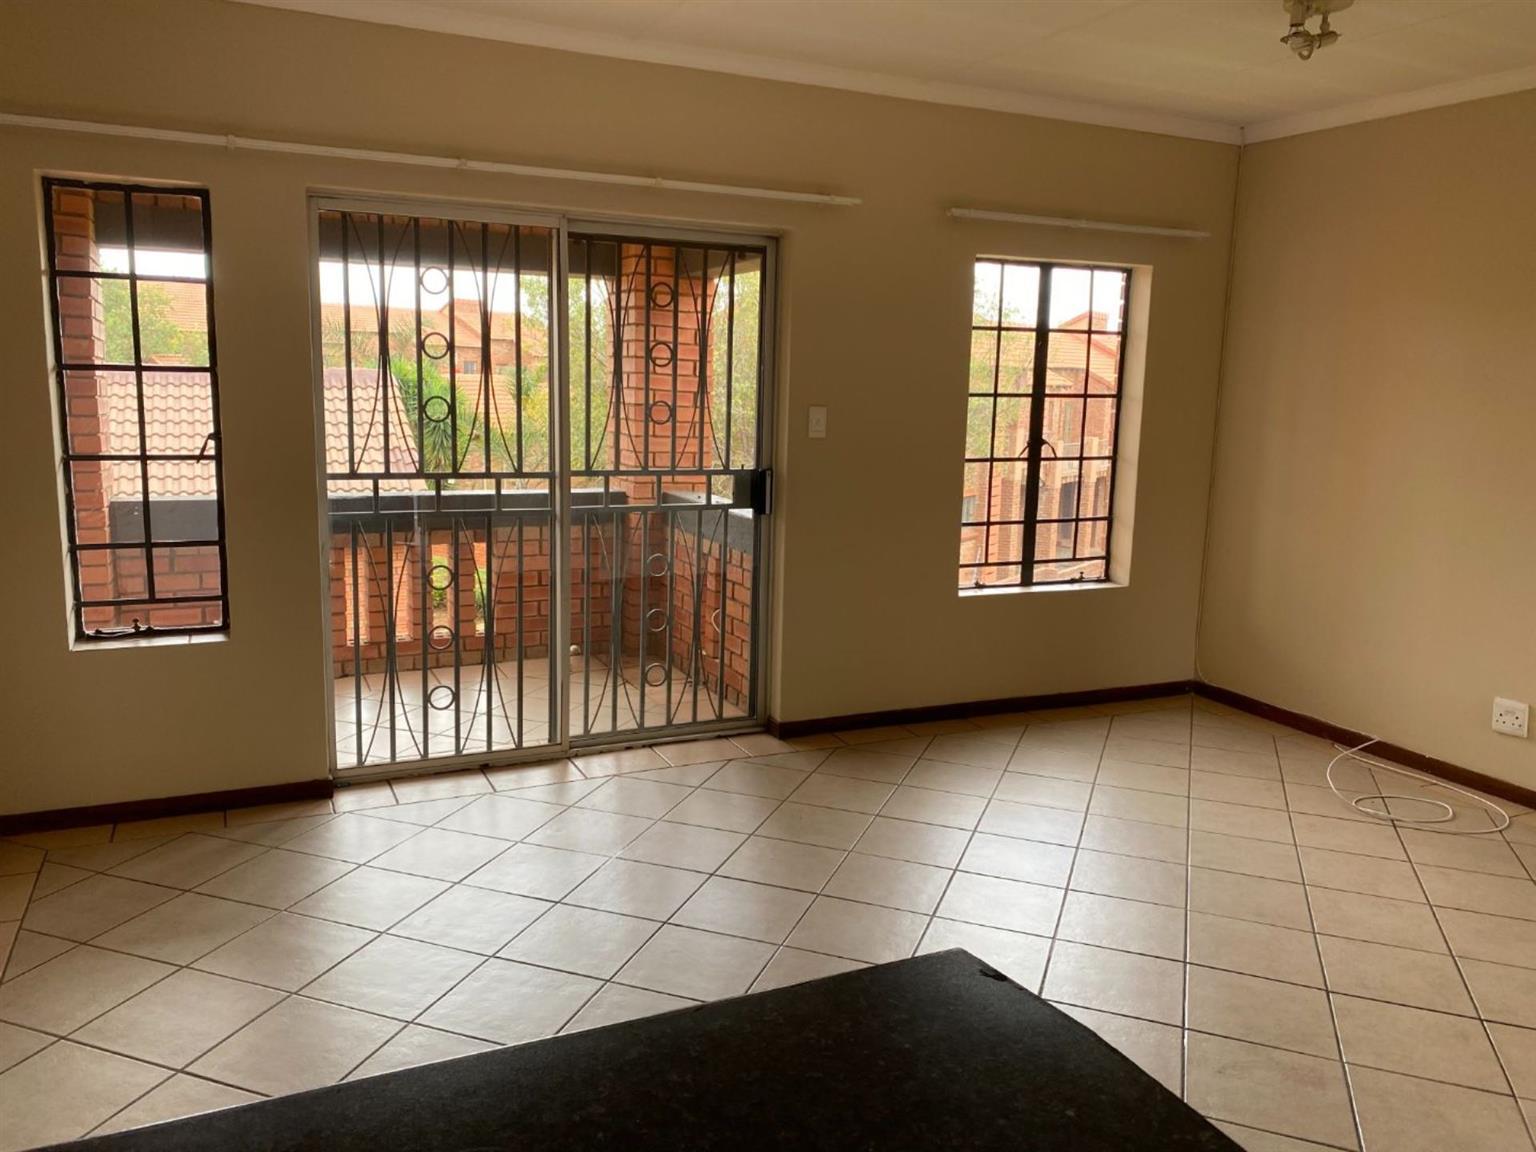 Apartment Rental Monthly in MOOIKLOOF RIDGE